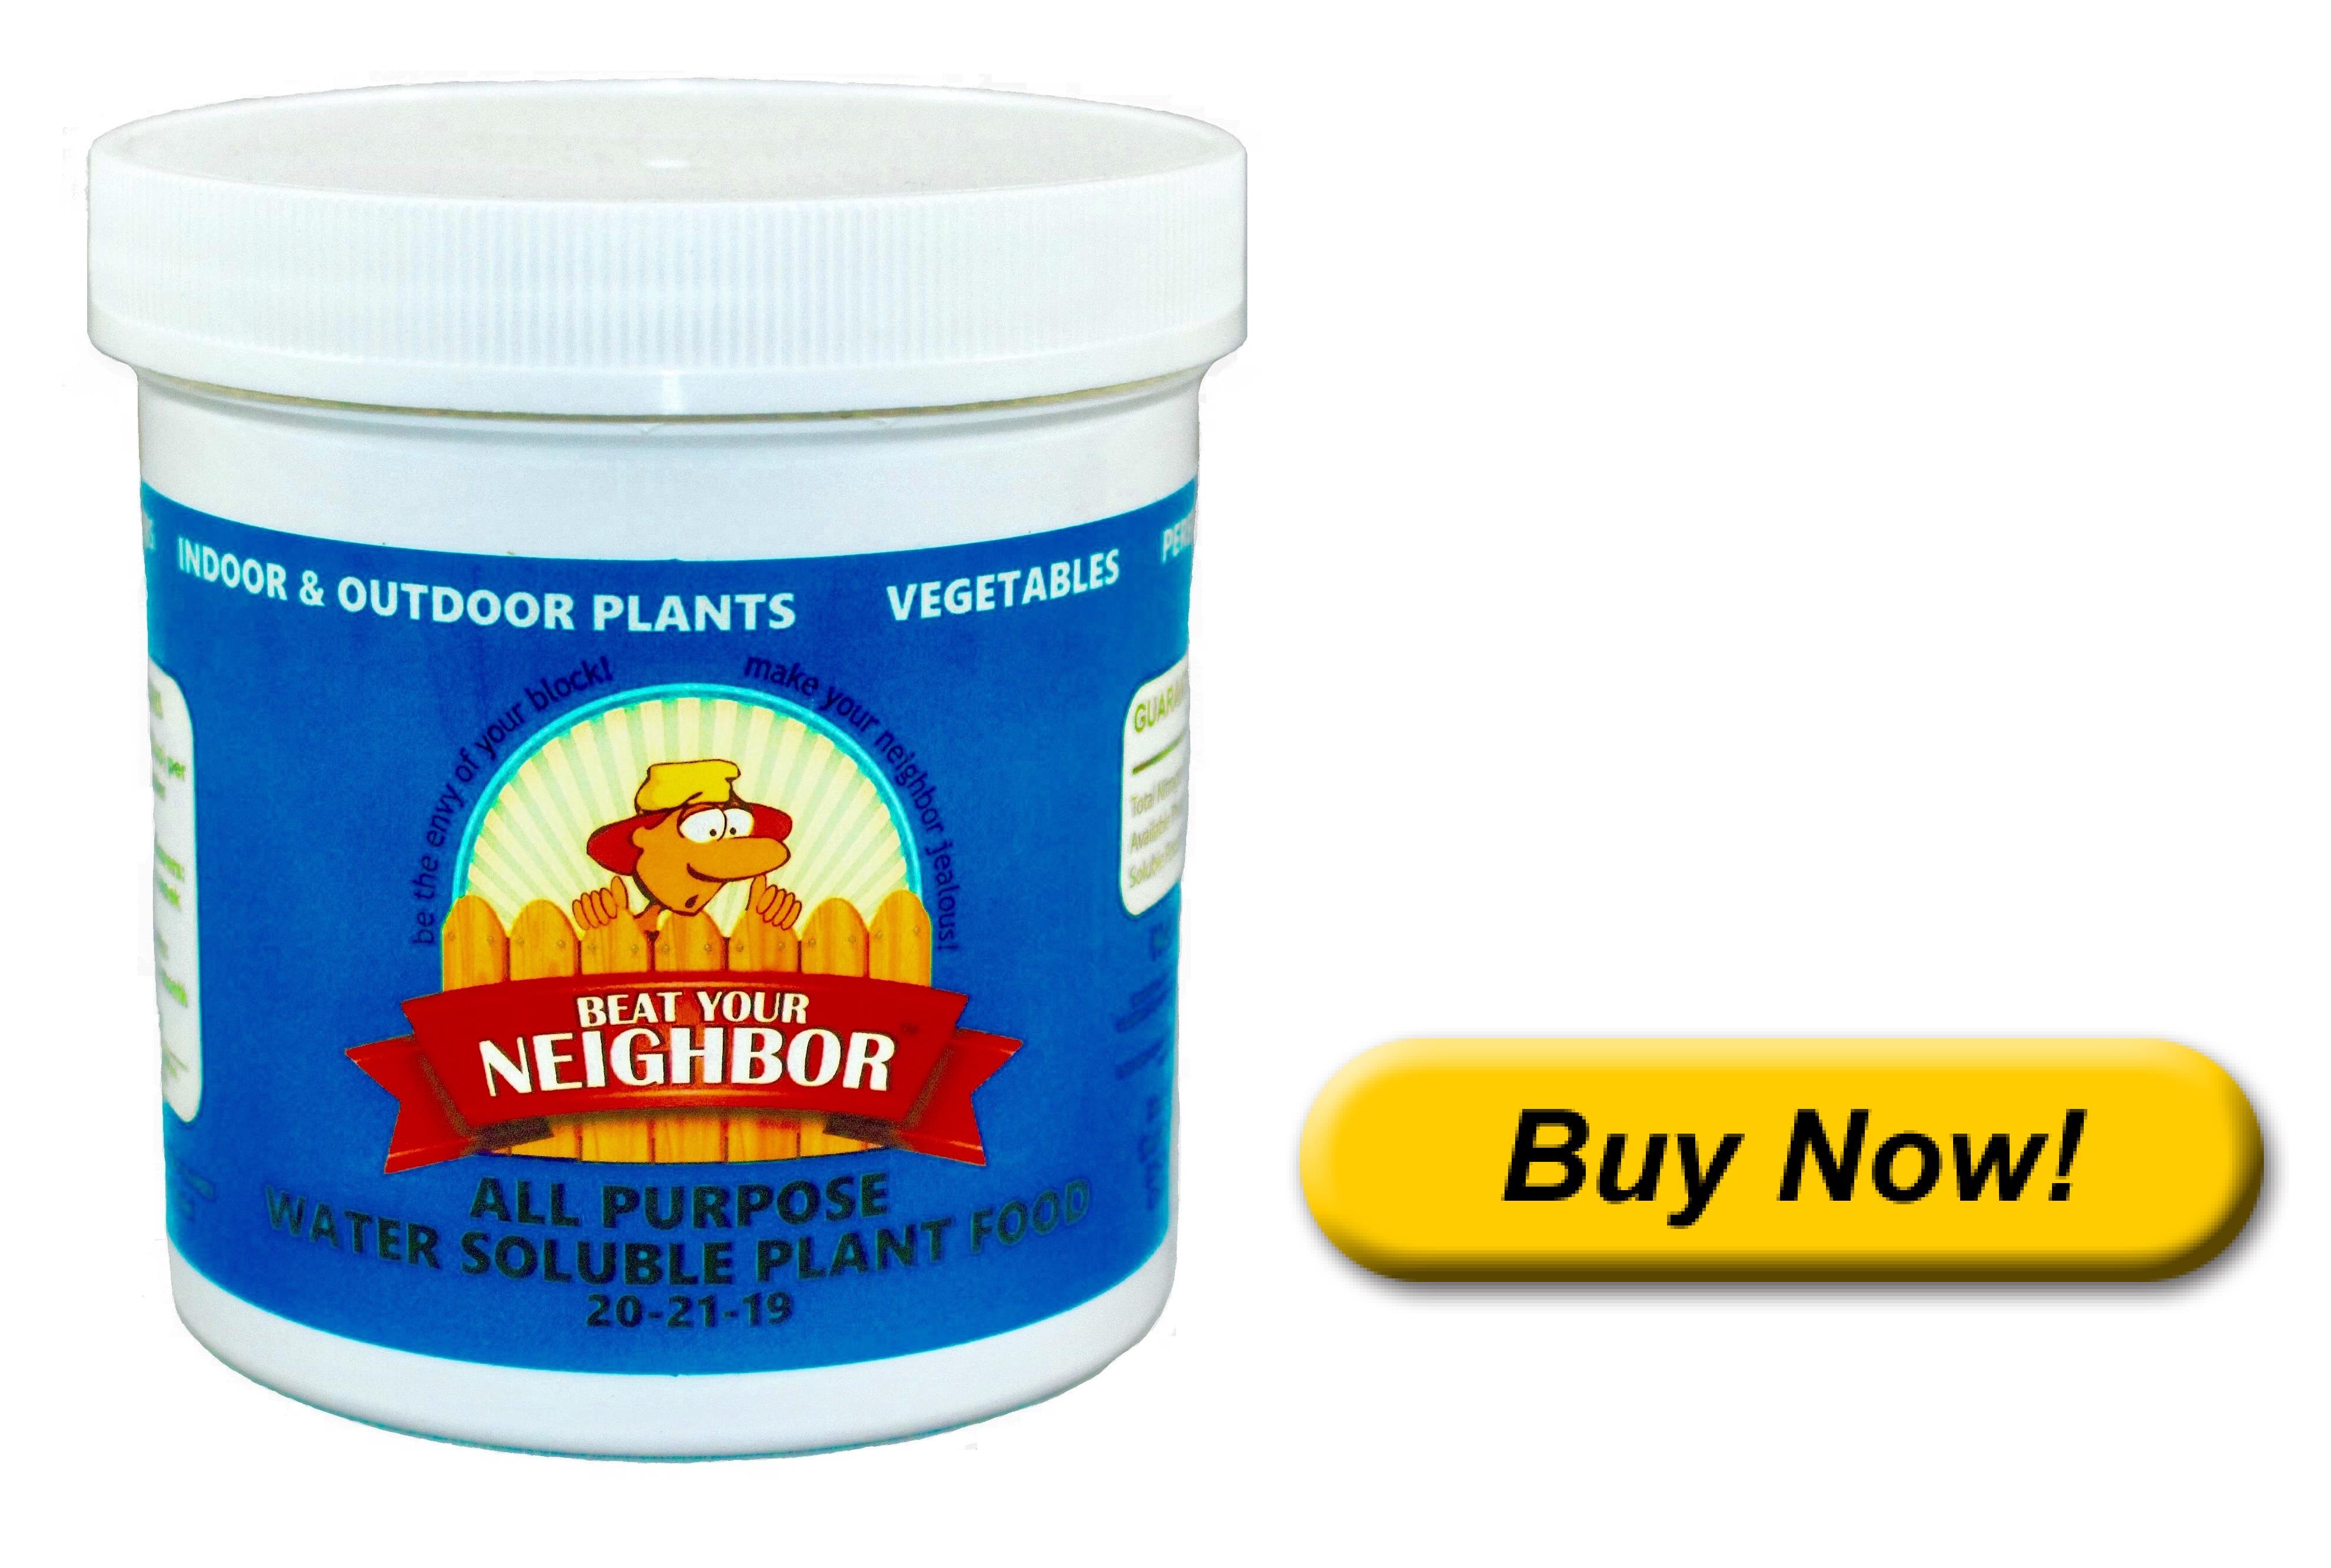 product-single-jar-1a-buy-now.jpg